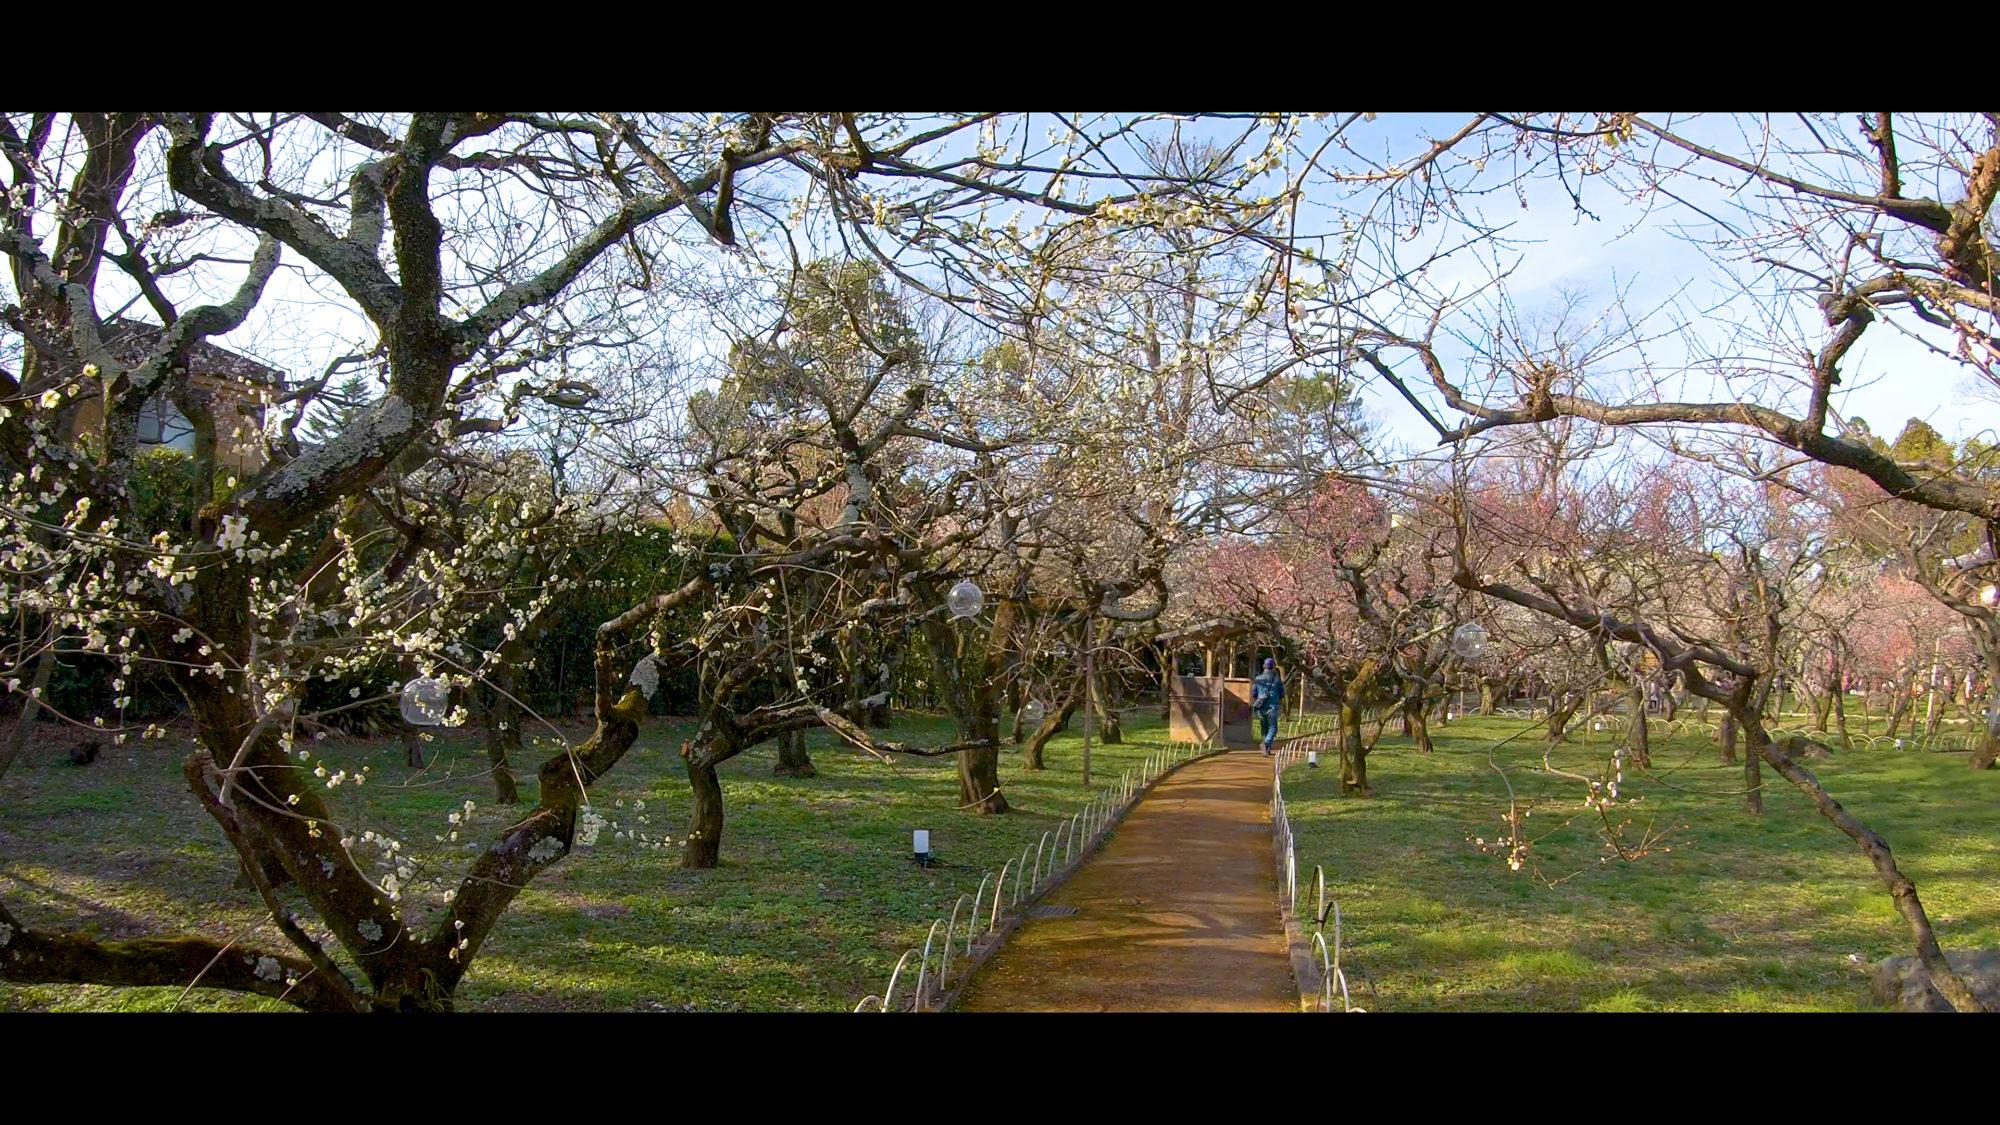 9ce0143b73f5a100ffb0b25f3b961402-e1582382900978 京都府 北野天満宮 Kitano Tenmangu (2020年 京都の春におすすめ梅苑・梅林スポット! 撮影した写真の紹介、ライトアップ・アクセス情報や交通手段・駐車場情報などまとめ)